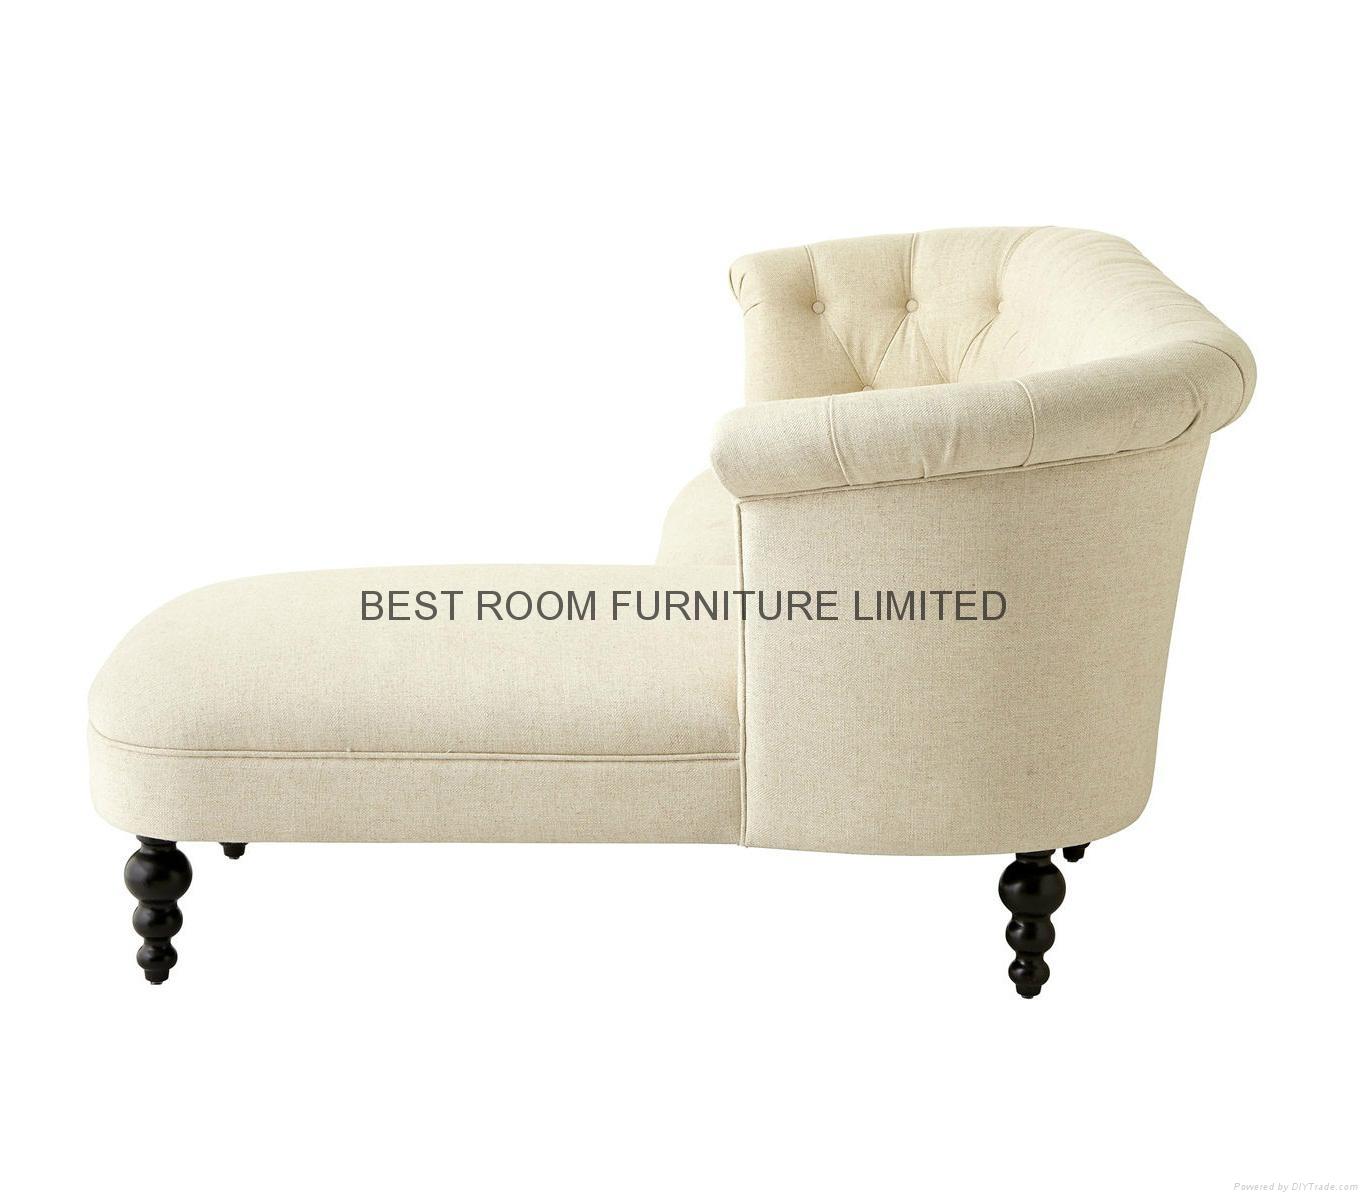 mordern liene  fabric tuffed hot-sold american furniture corner sofa with chaise 3